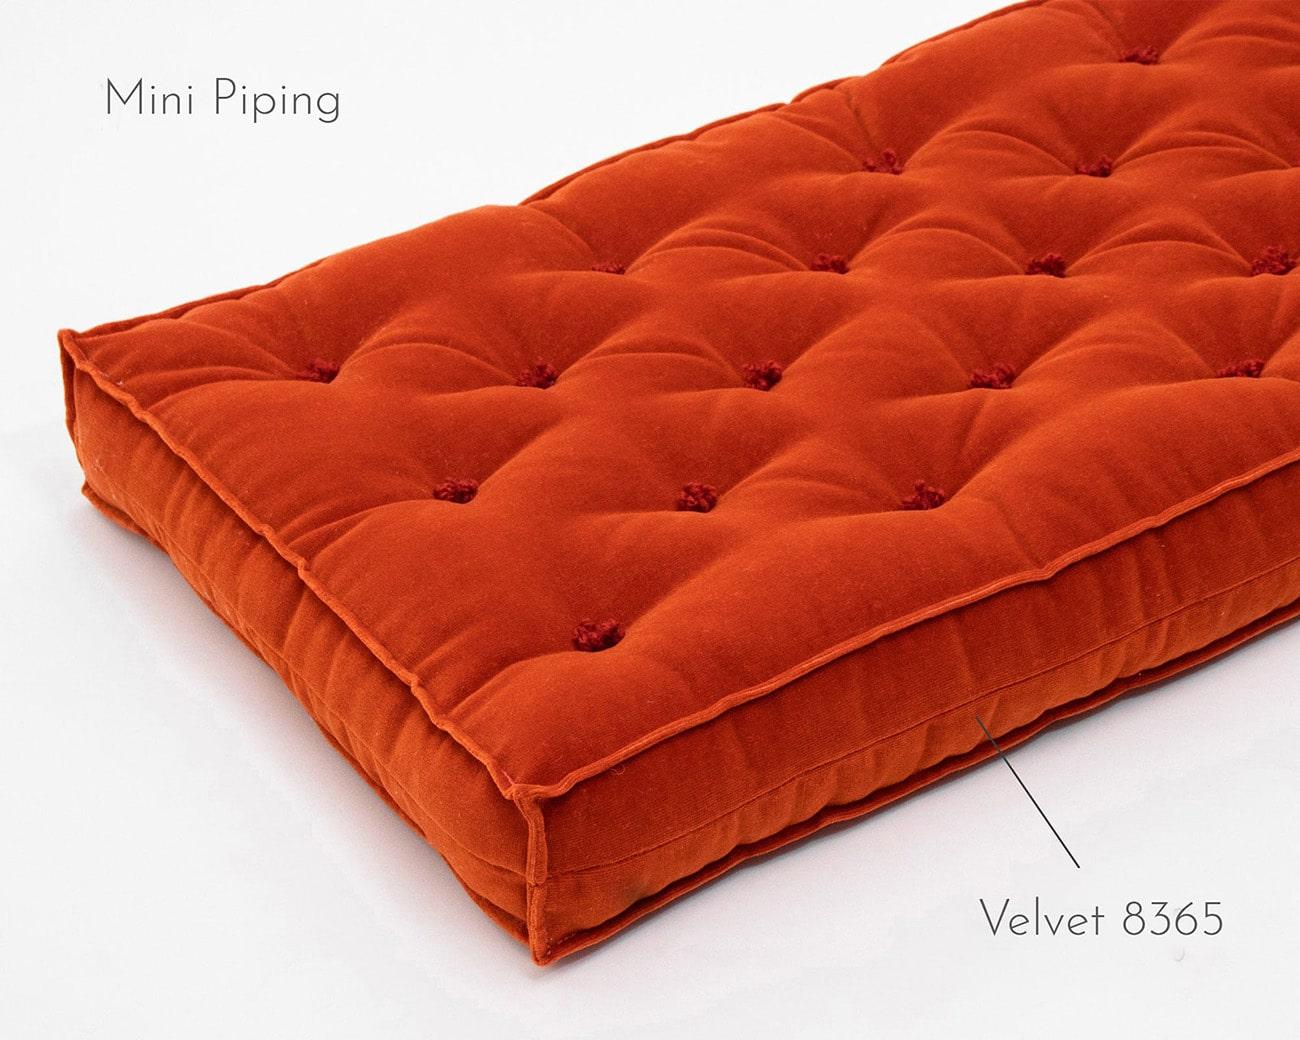 3 Tufted Cushion Cottoned Shop Handmade Bedding Decor